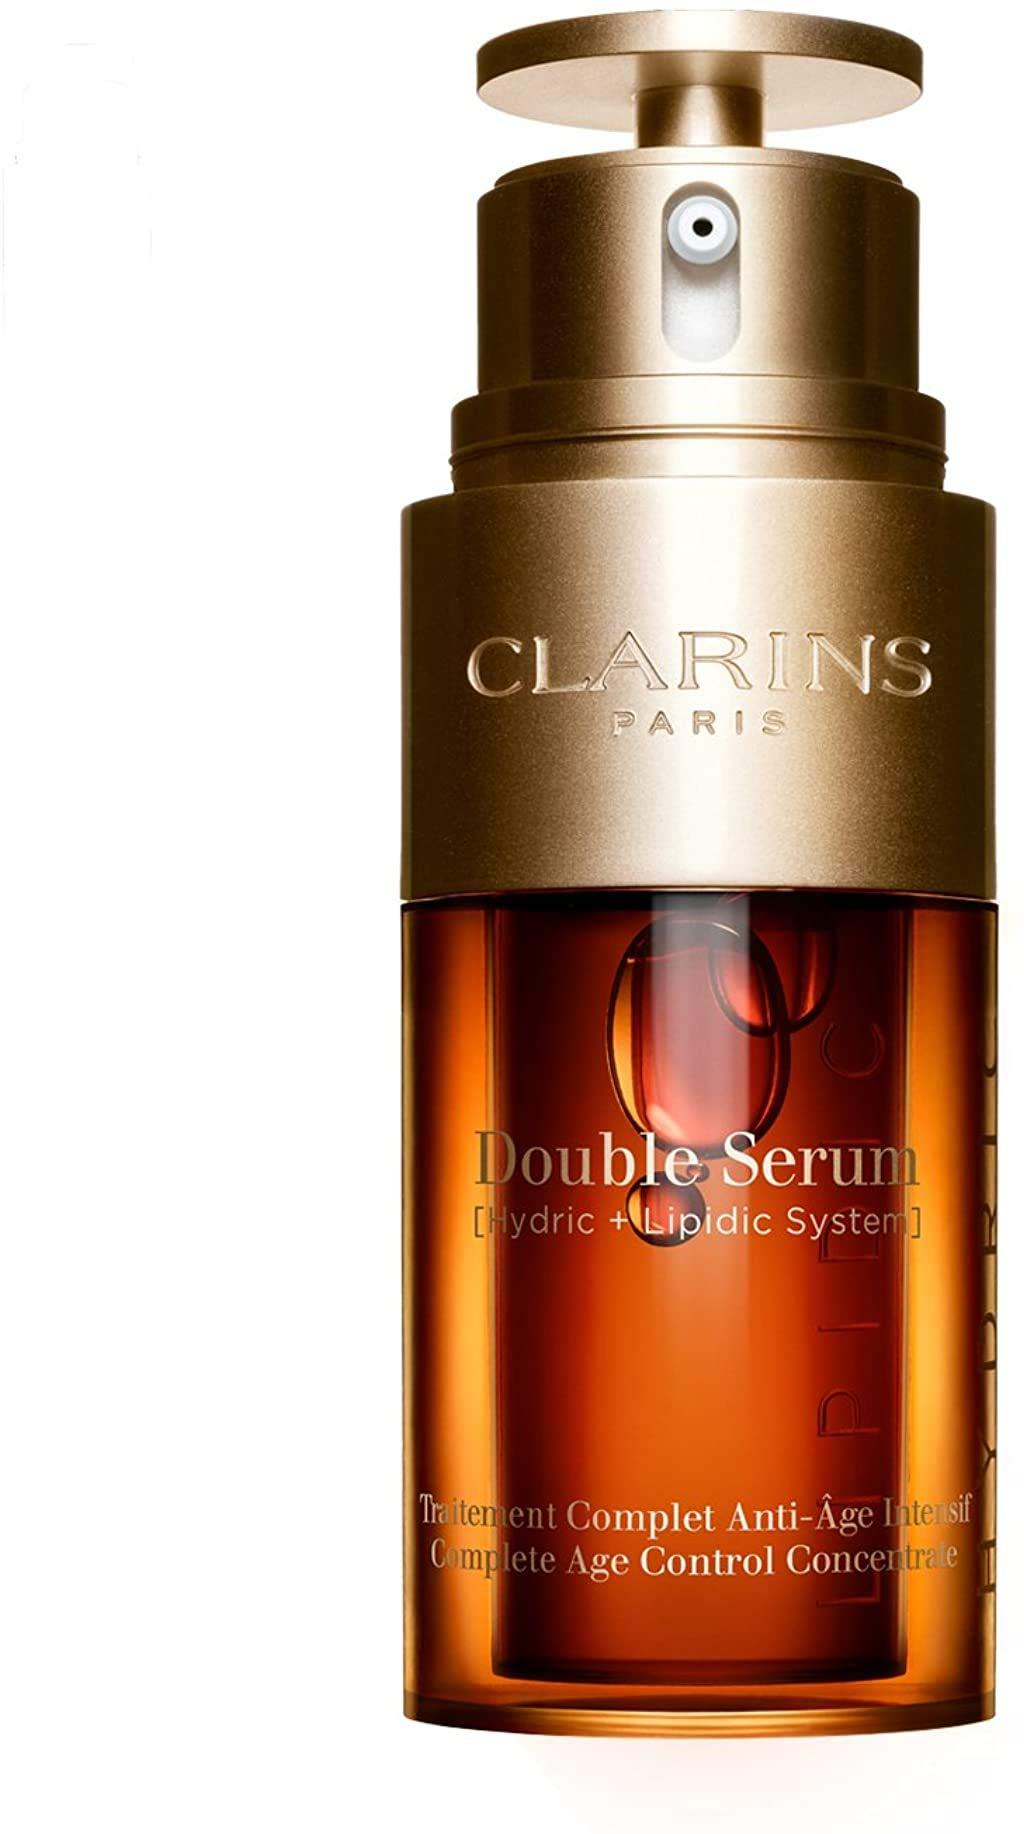 Clarins Double Serum Anti-aging, Clear, 1 Fl Oz